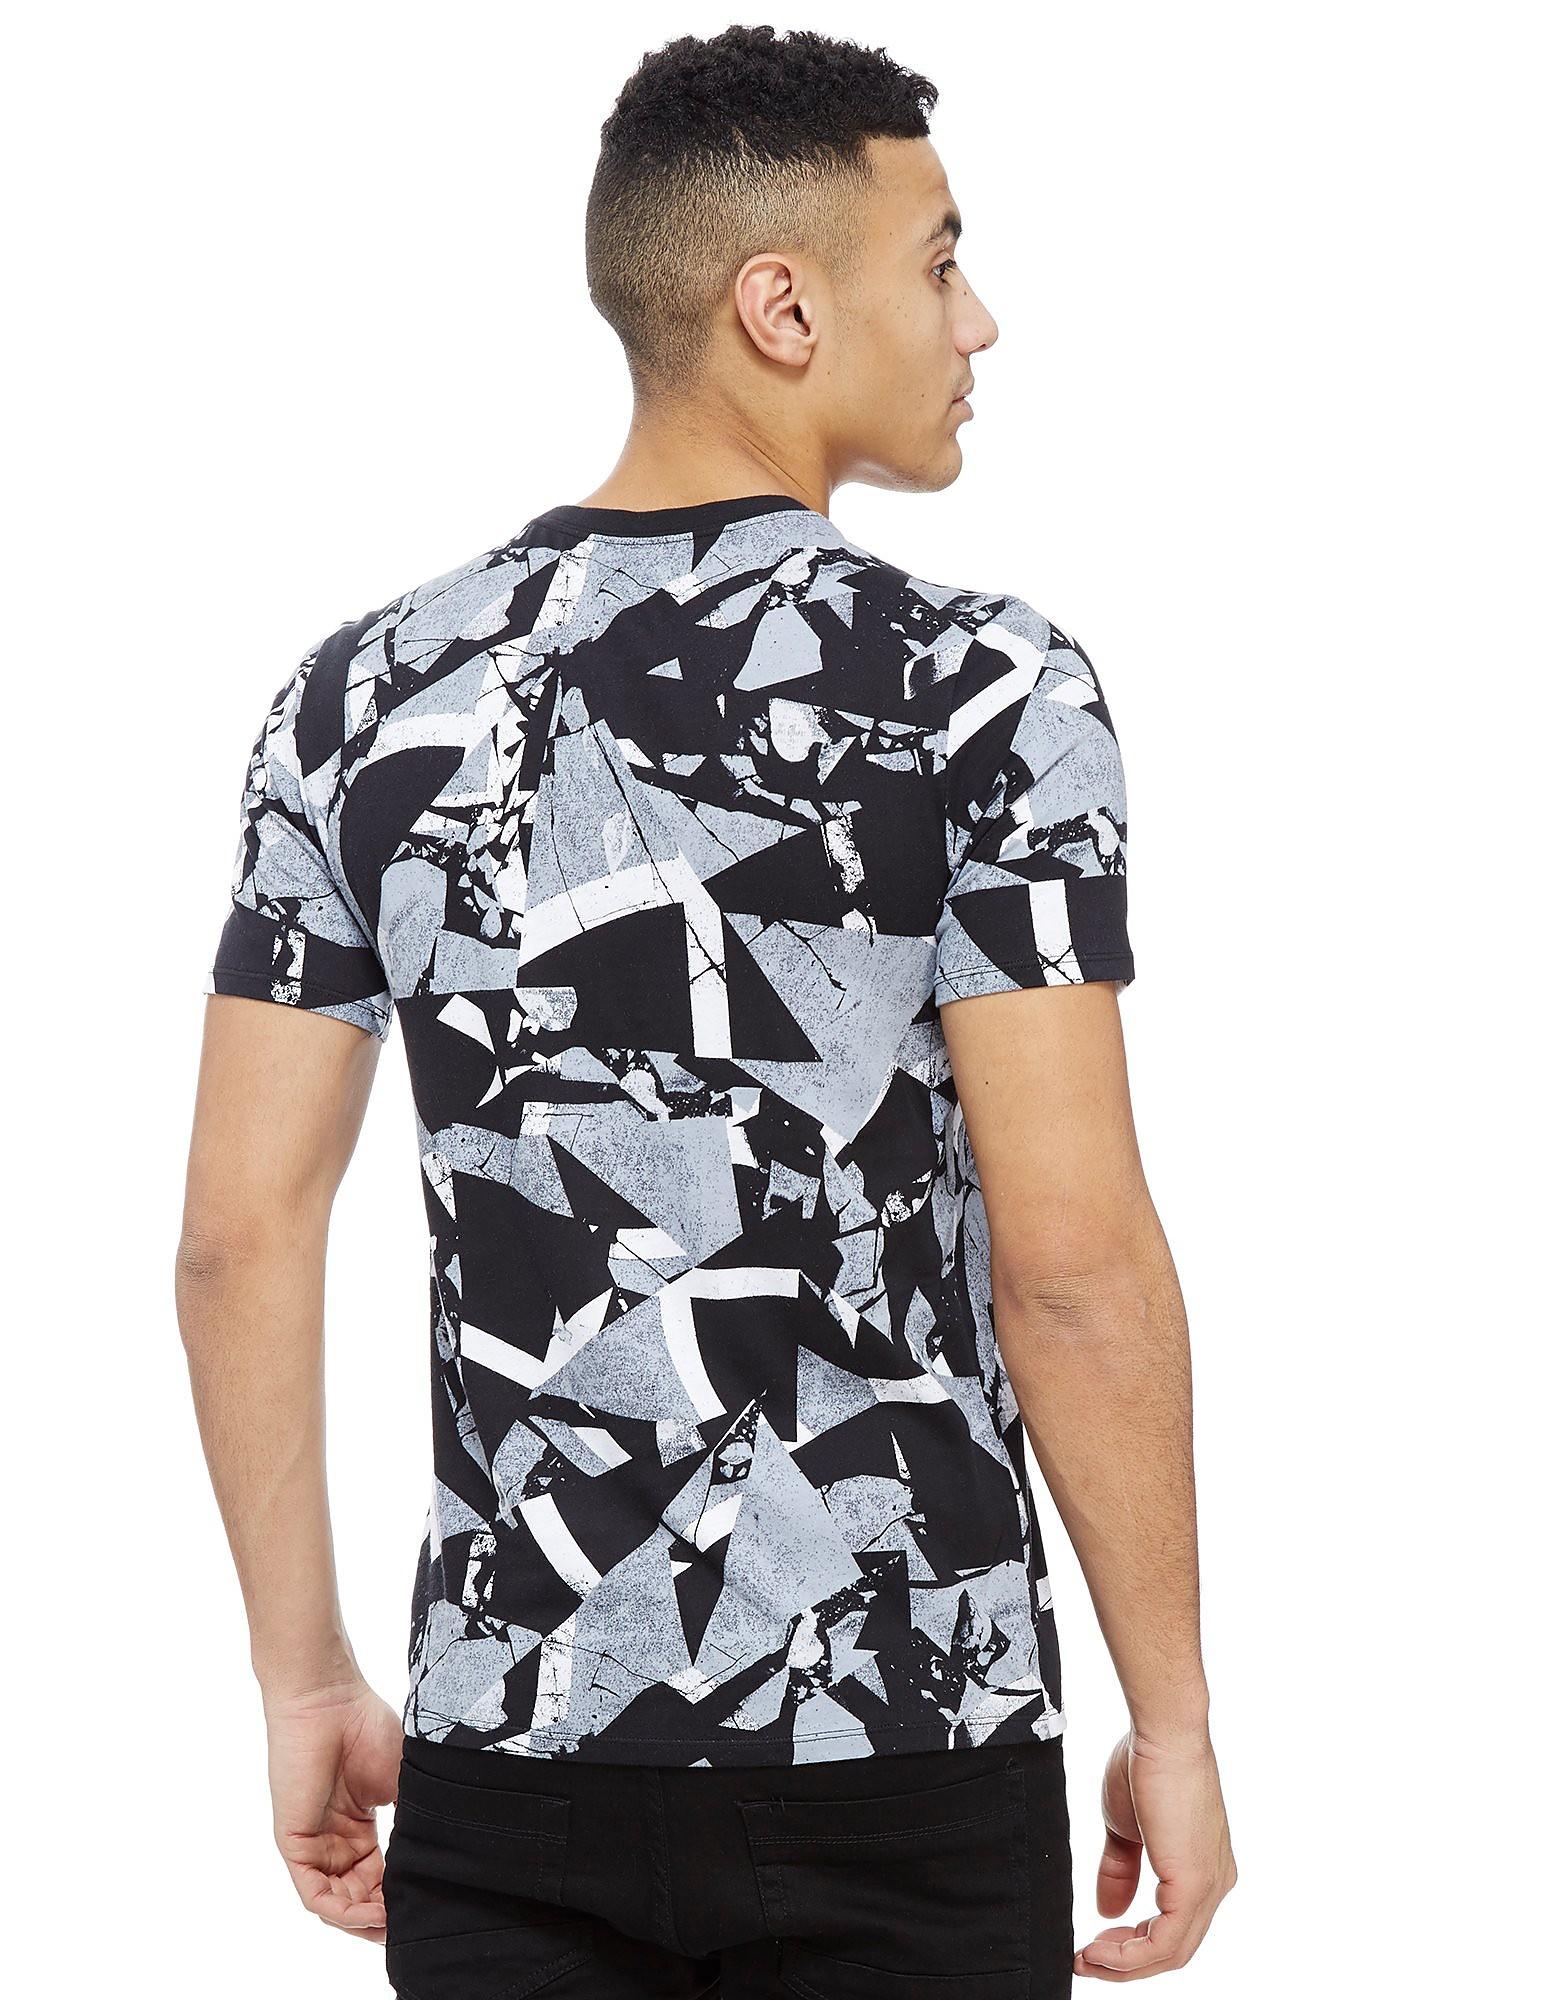 Nike Air All-Over Print T-Shirt